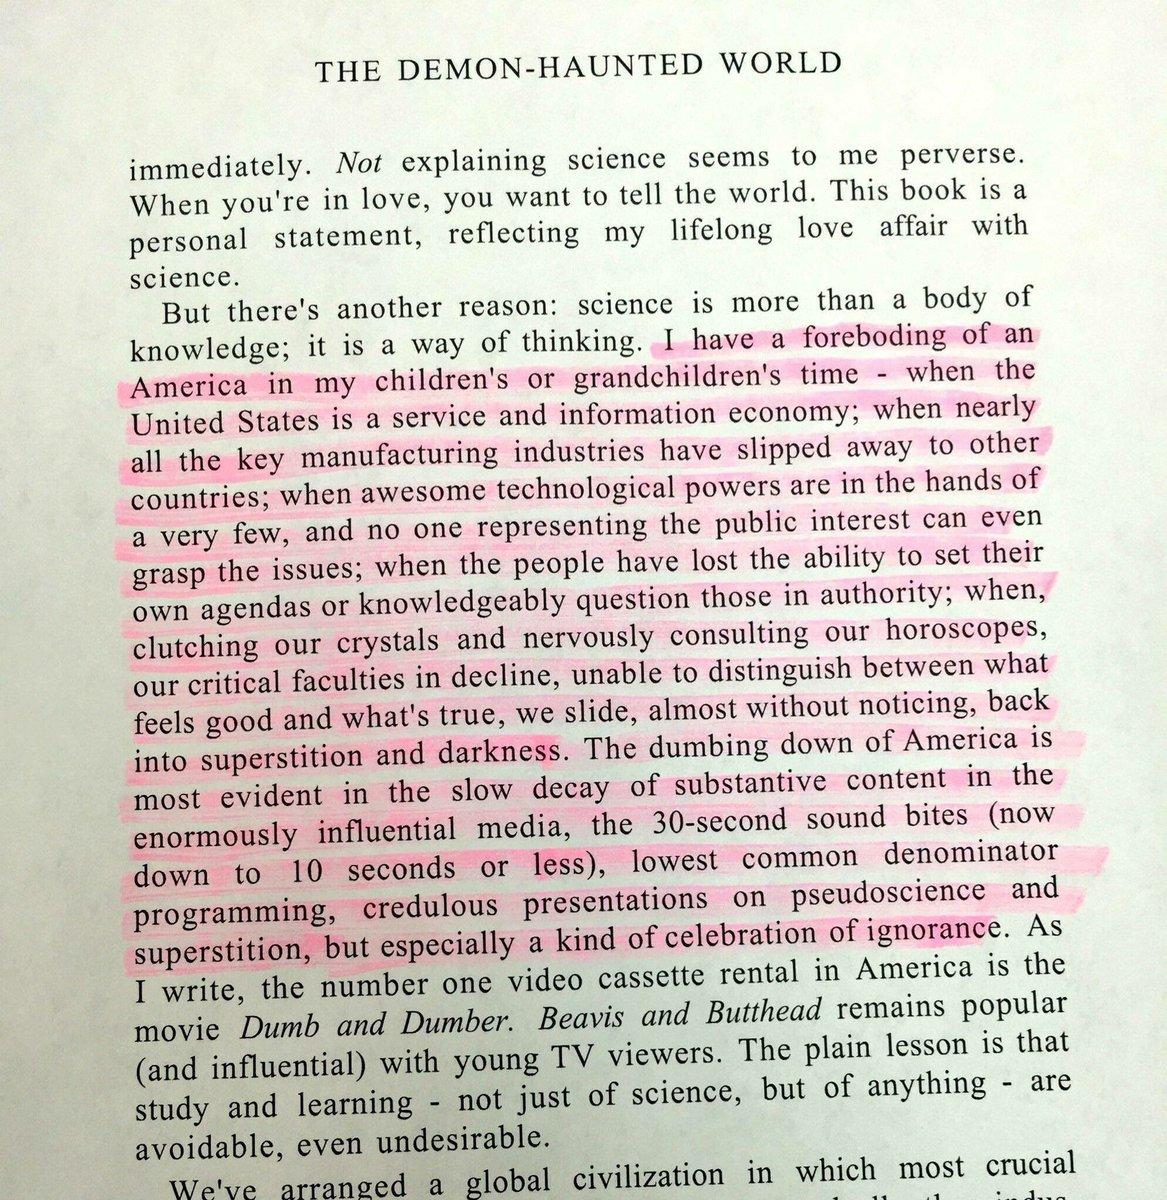 Carl Sagan 1996 https://t.co/jhbezqCe1r